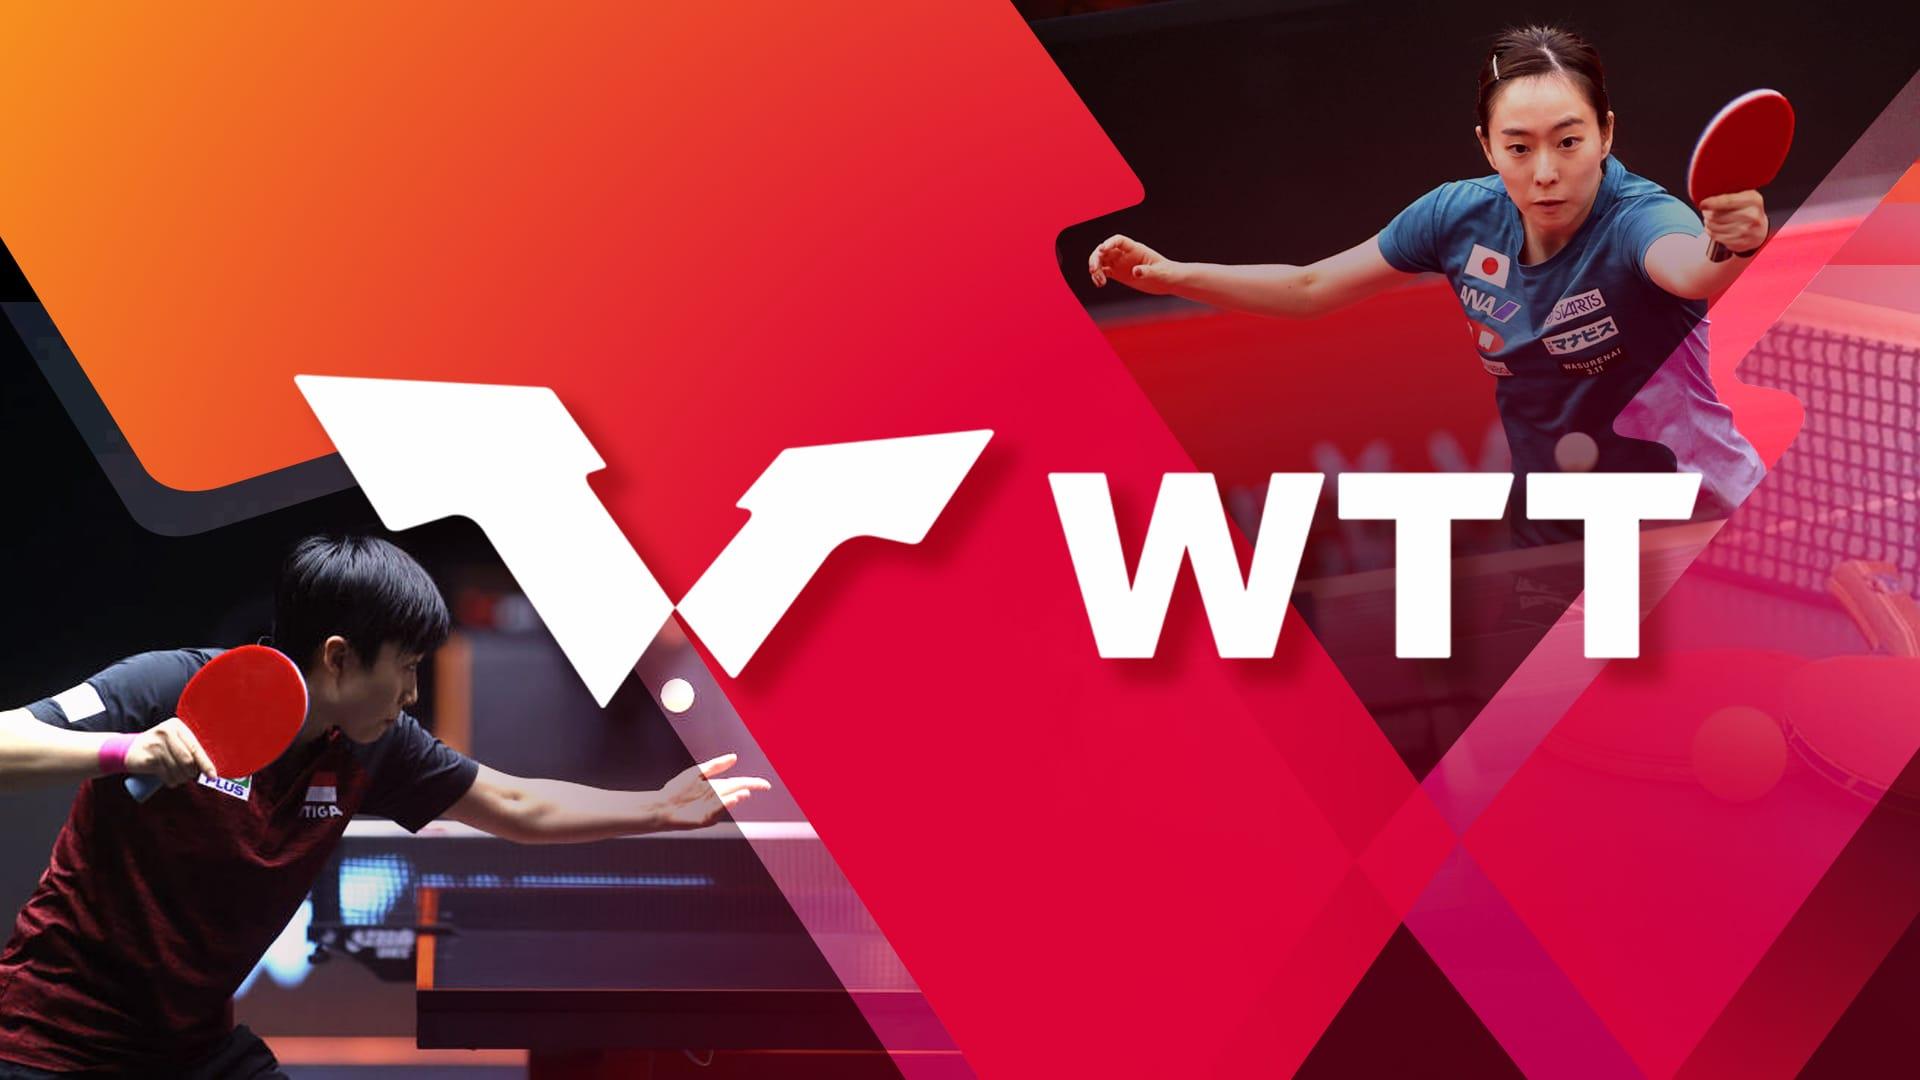 Girraphic WTT Cover Image 2